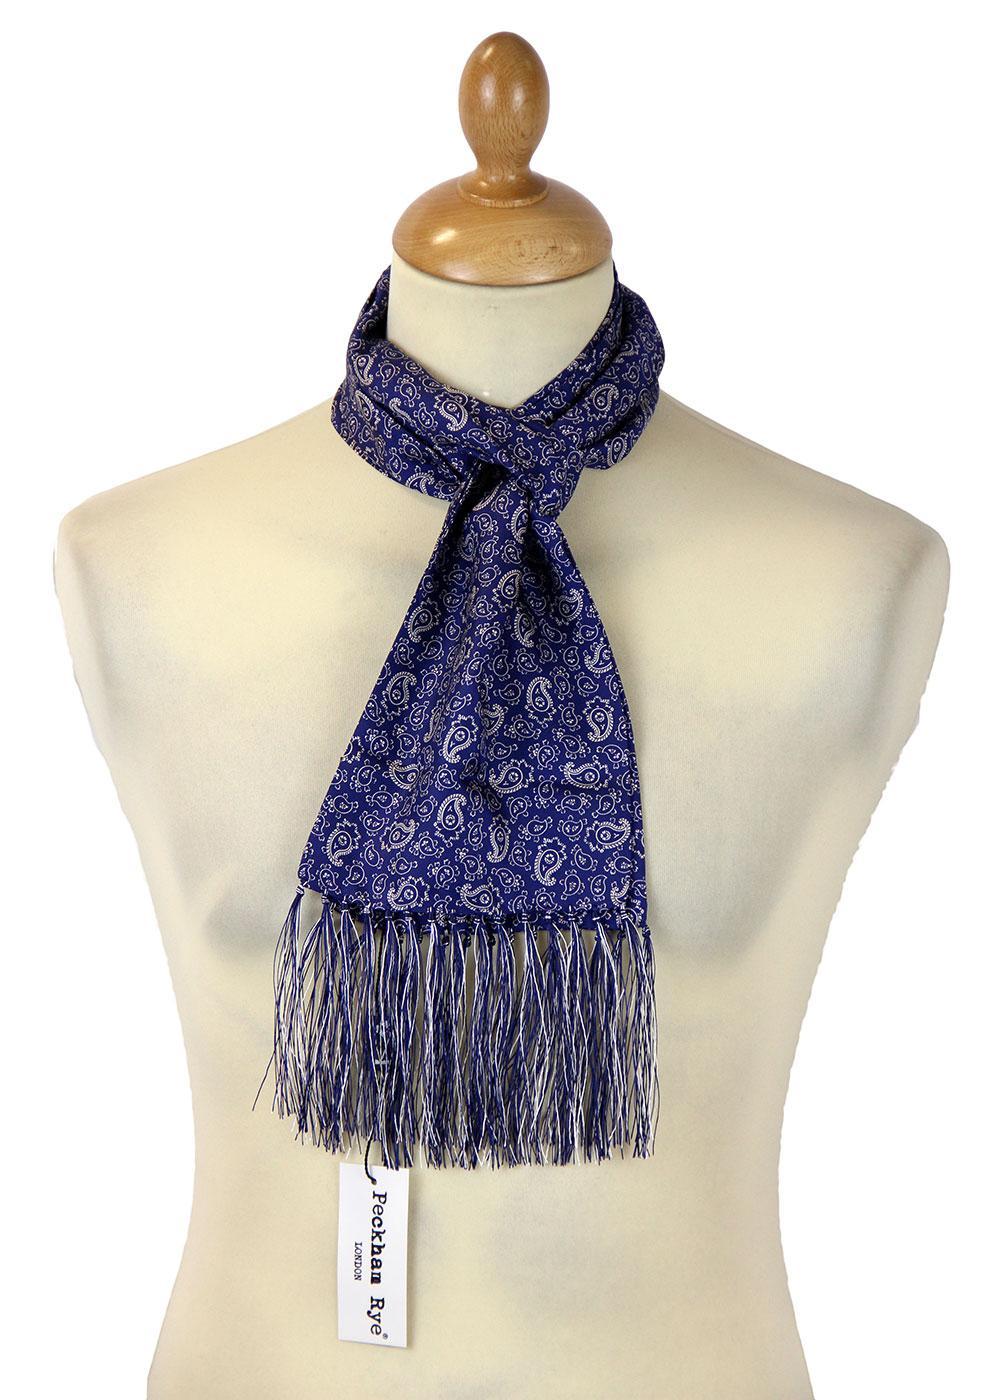 peckham rye retro 60s mod paisley silk scarf navy ground white